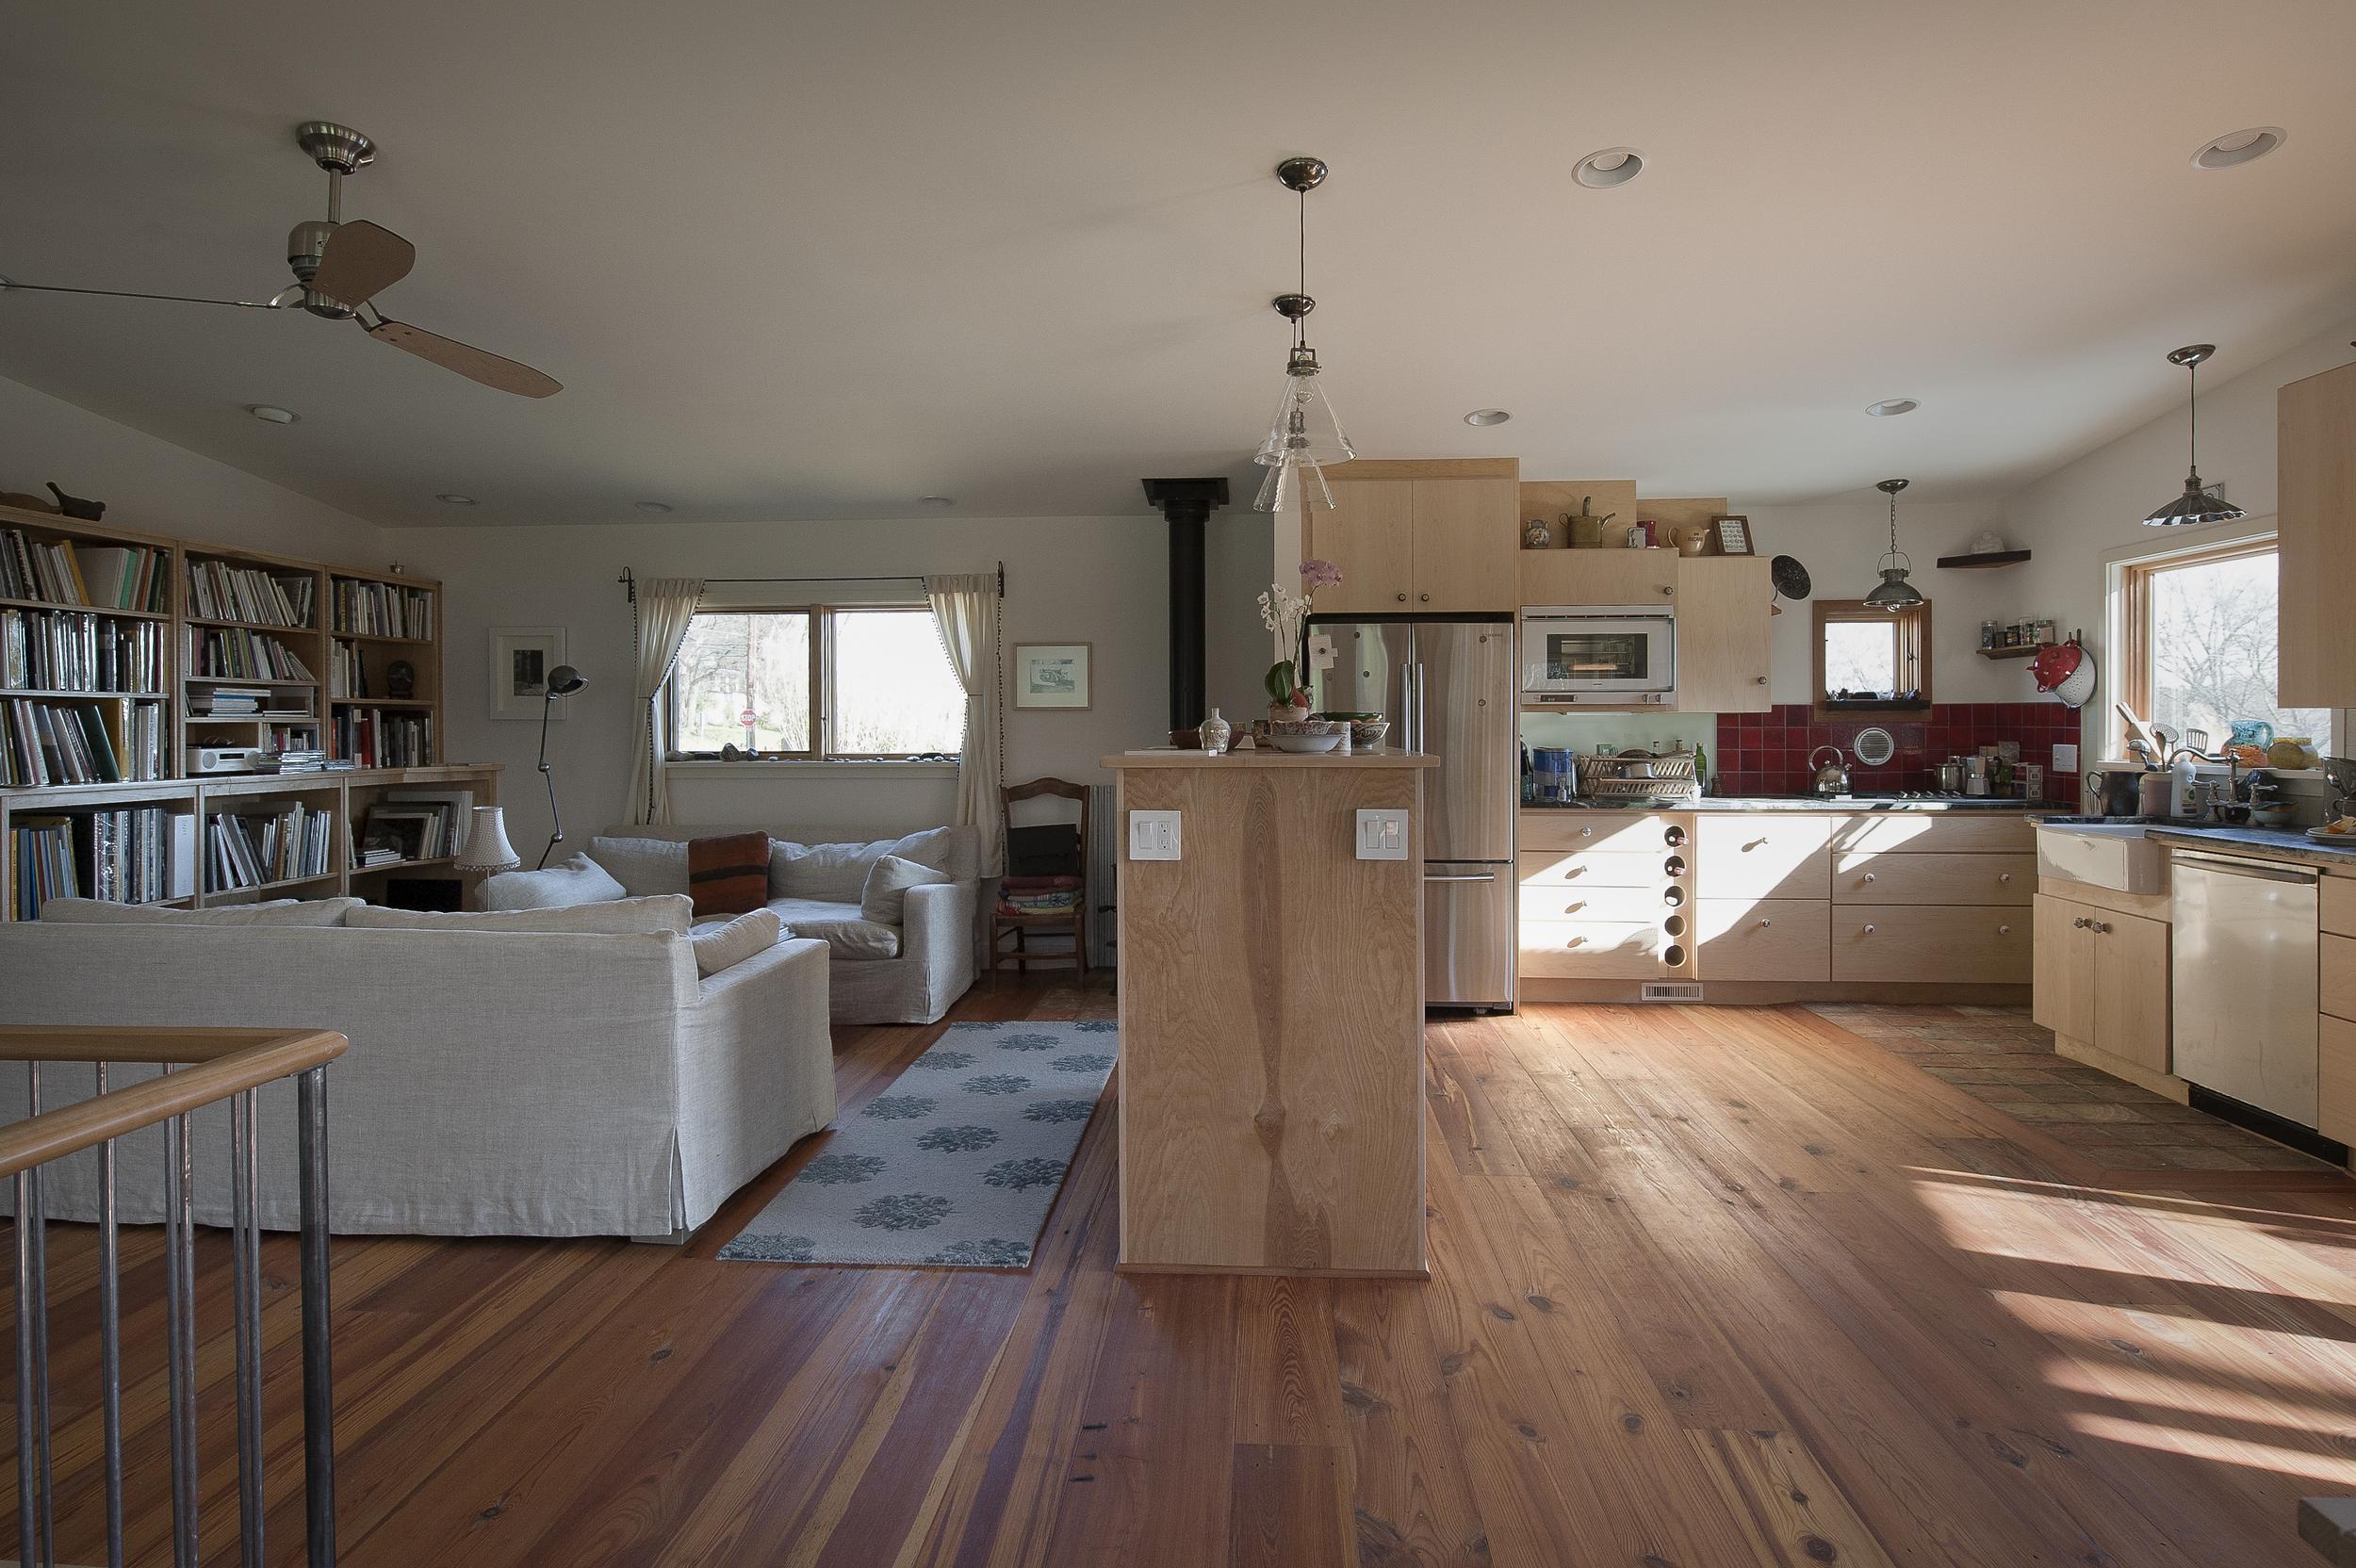 living-kitchen-area.jpg